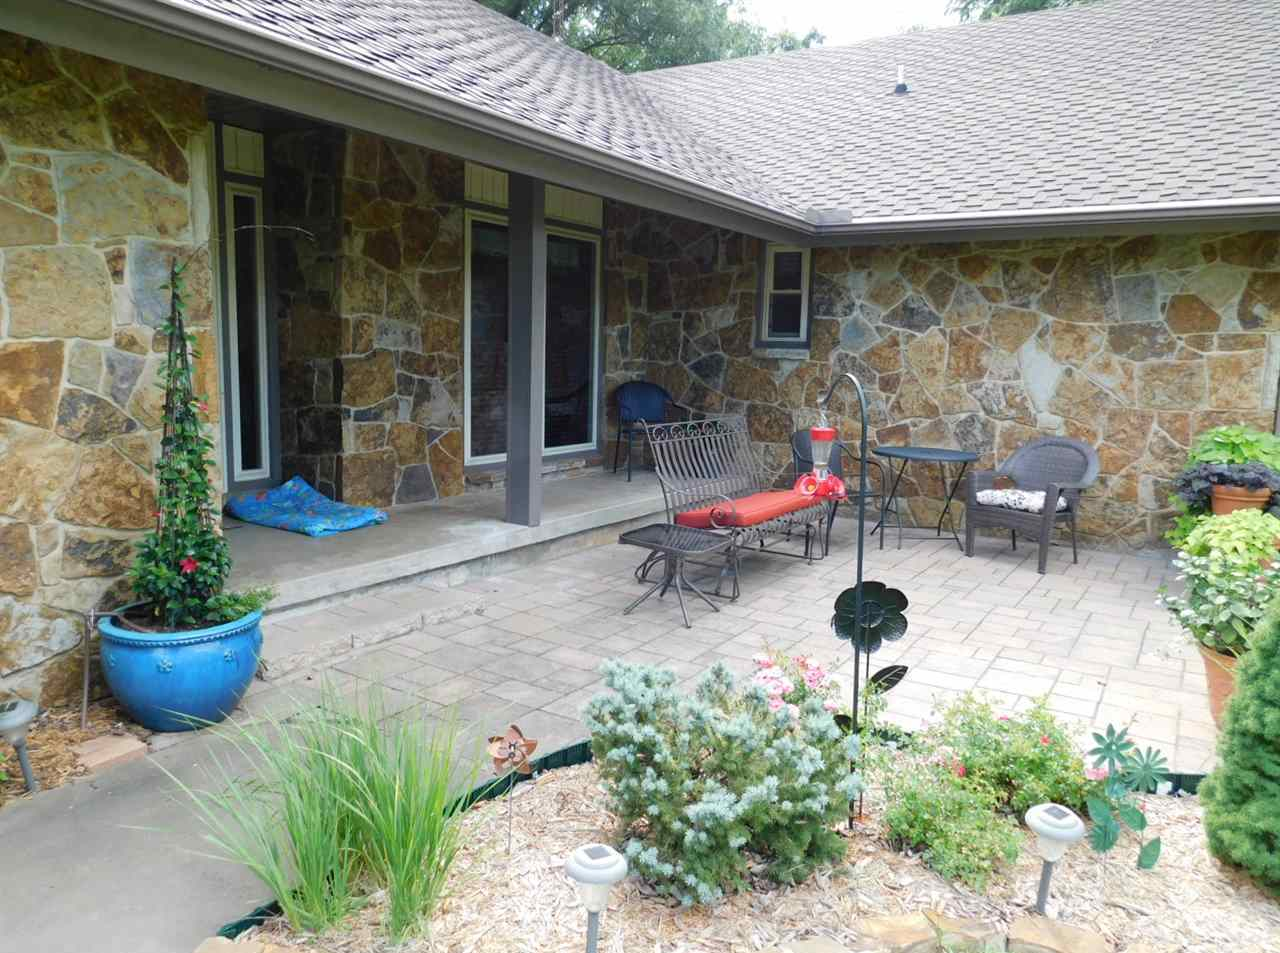 Sold Intraoffice W/MLS | 279 Braden School Rd.  Ponca City, OK 74604 1